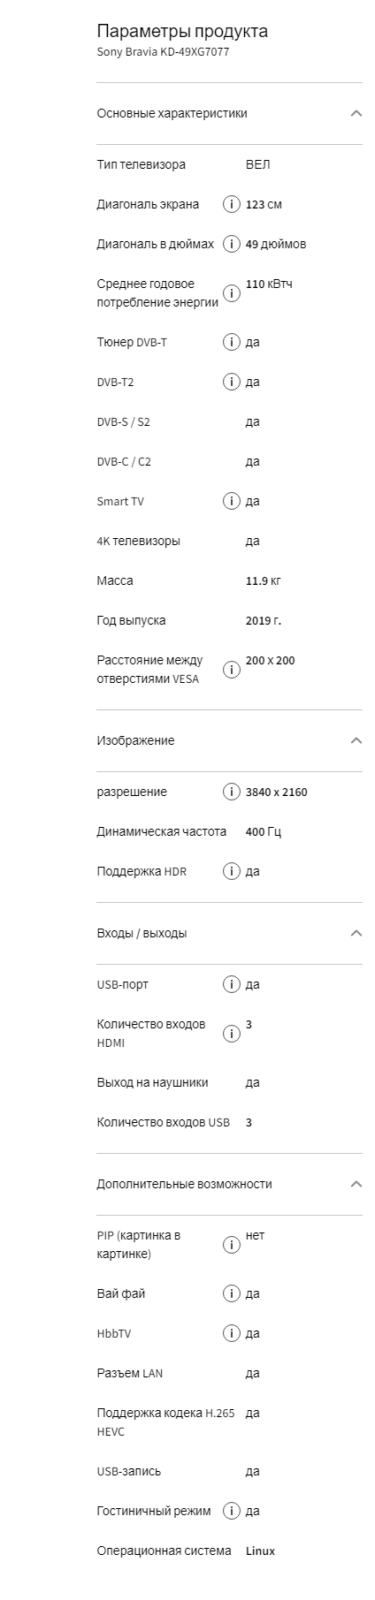 2021 03 27 184844